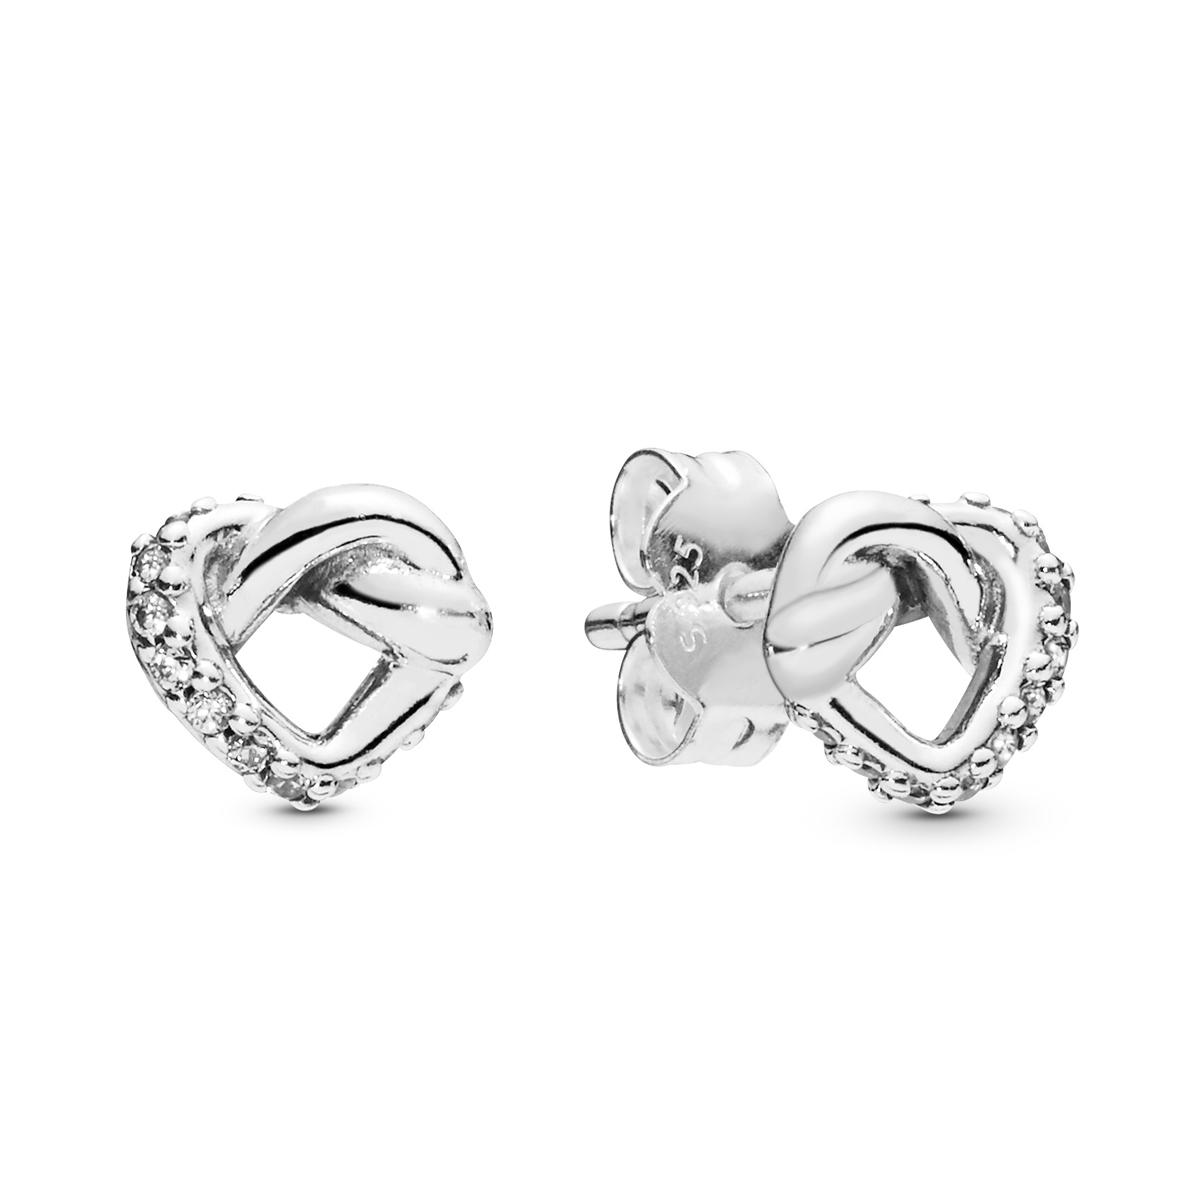 Pandora Knotted Heart Ring Pancharmbracelets Com